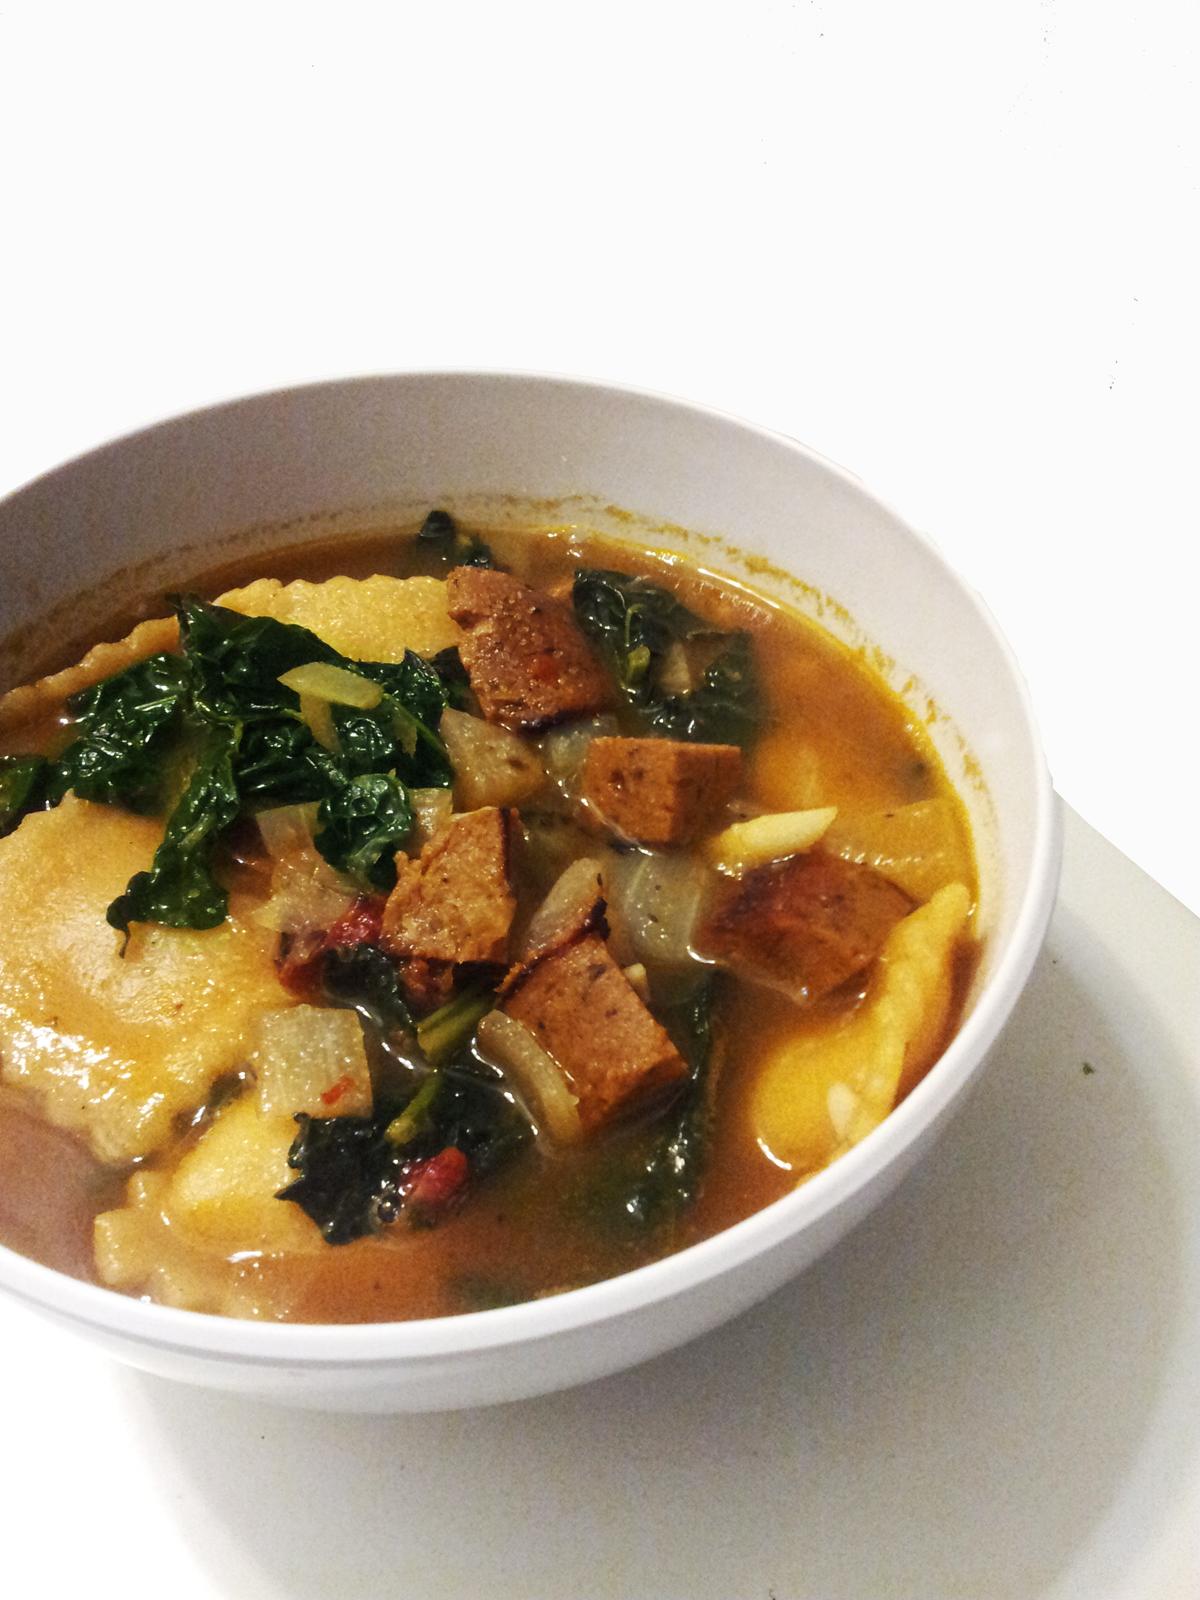 Profound Hatred of Meat: Kale, Sausage & Ravioli Soup